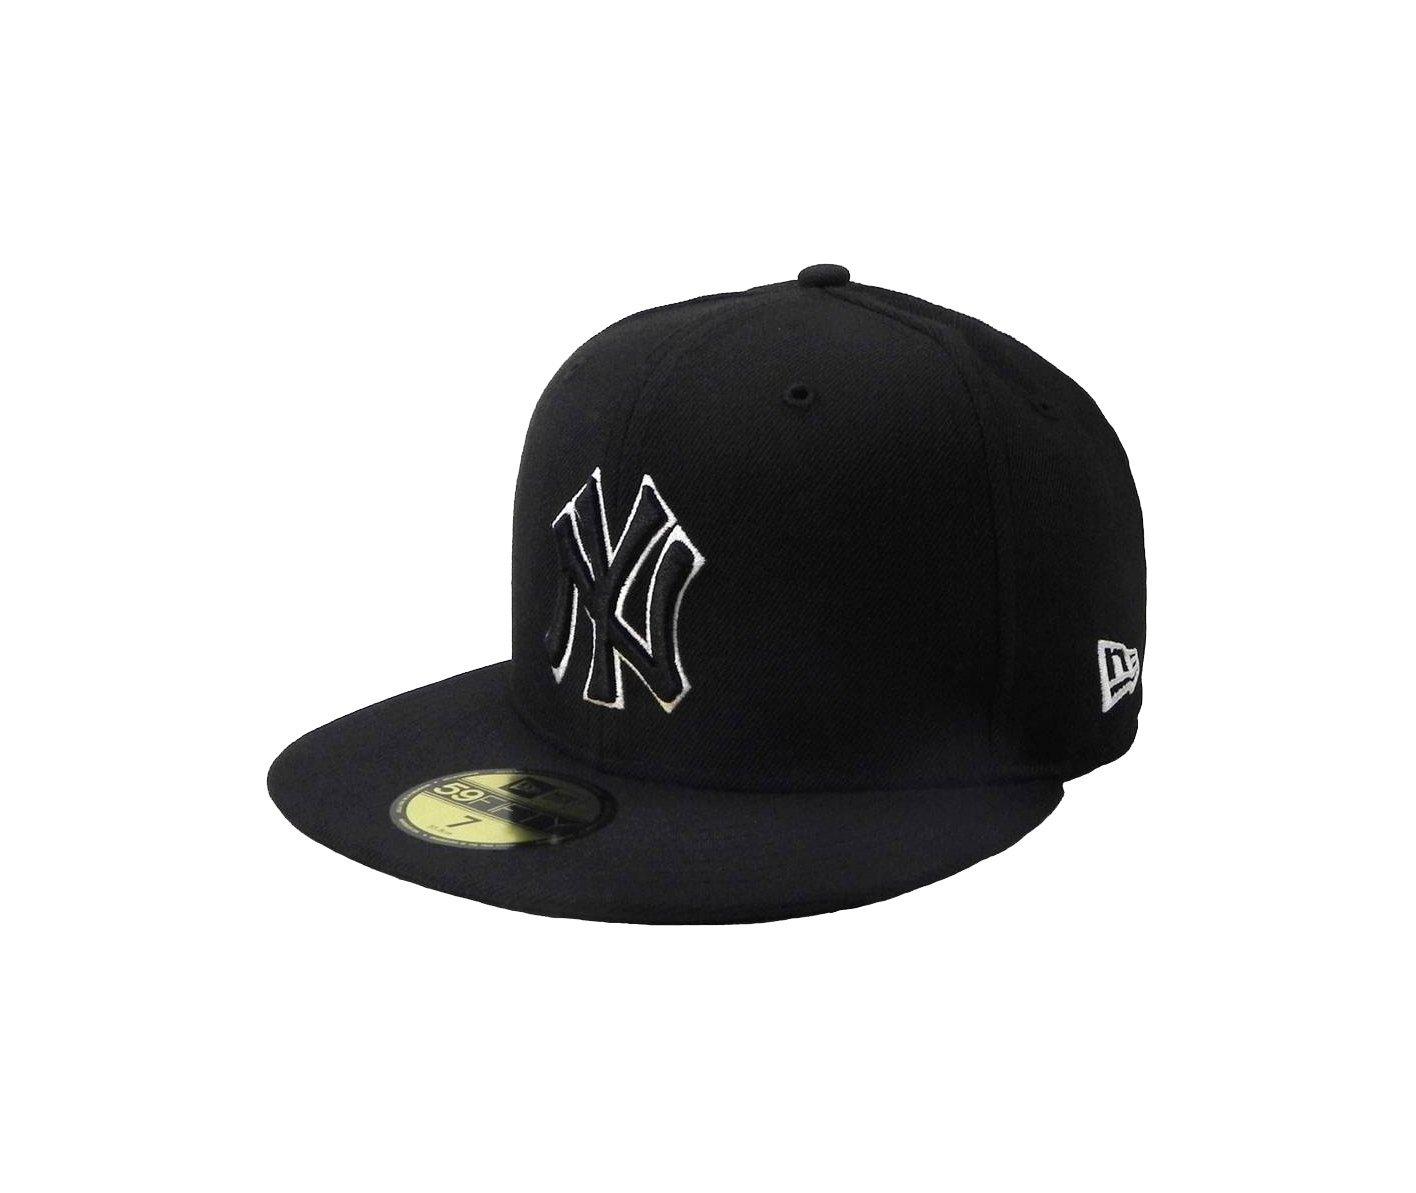 863956e927587 Get Quotations · New Era MLB cap New York Yankees men s headwear  black white fitted hat (8